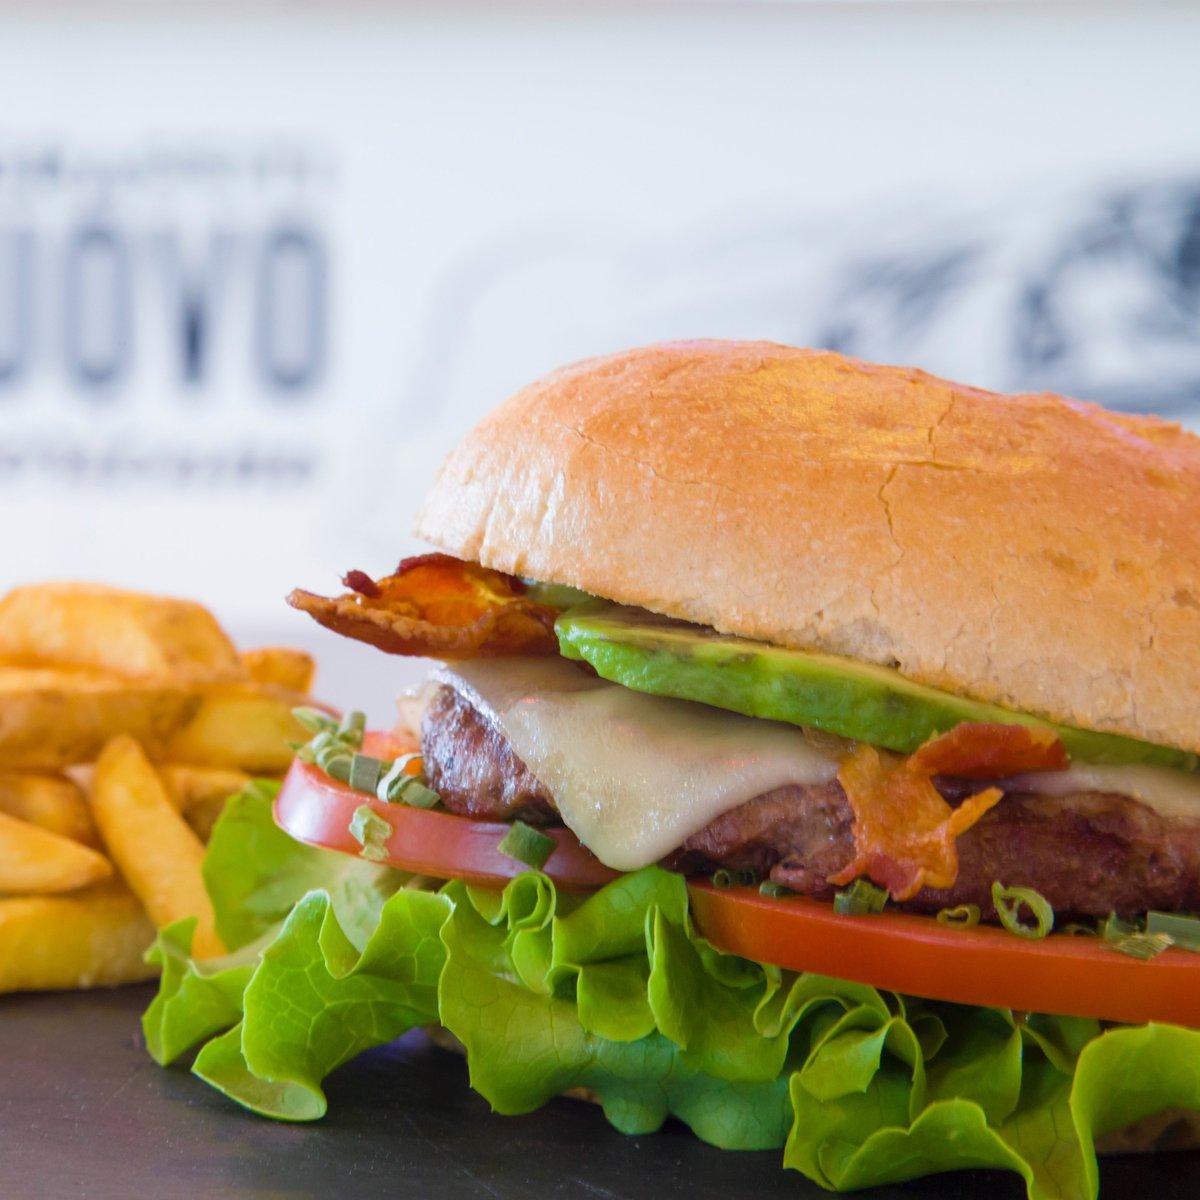 Miami Burger o Summer Turkey Sandwich, voi quale preferite? 😍   #americagraffiti #turkey #sandwich #gnam #food #summer #menu #new #summer #estate #fresh #food #foodporn #estate #burger #avocado https://t.co/VLAv1o3VZd